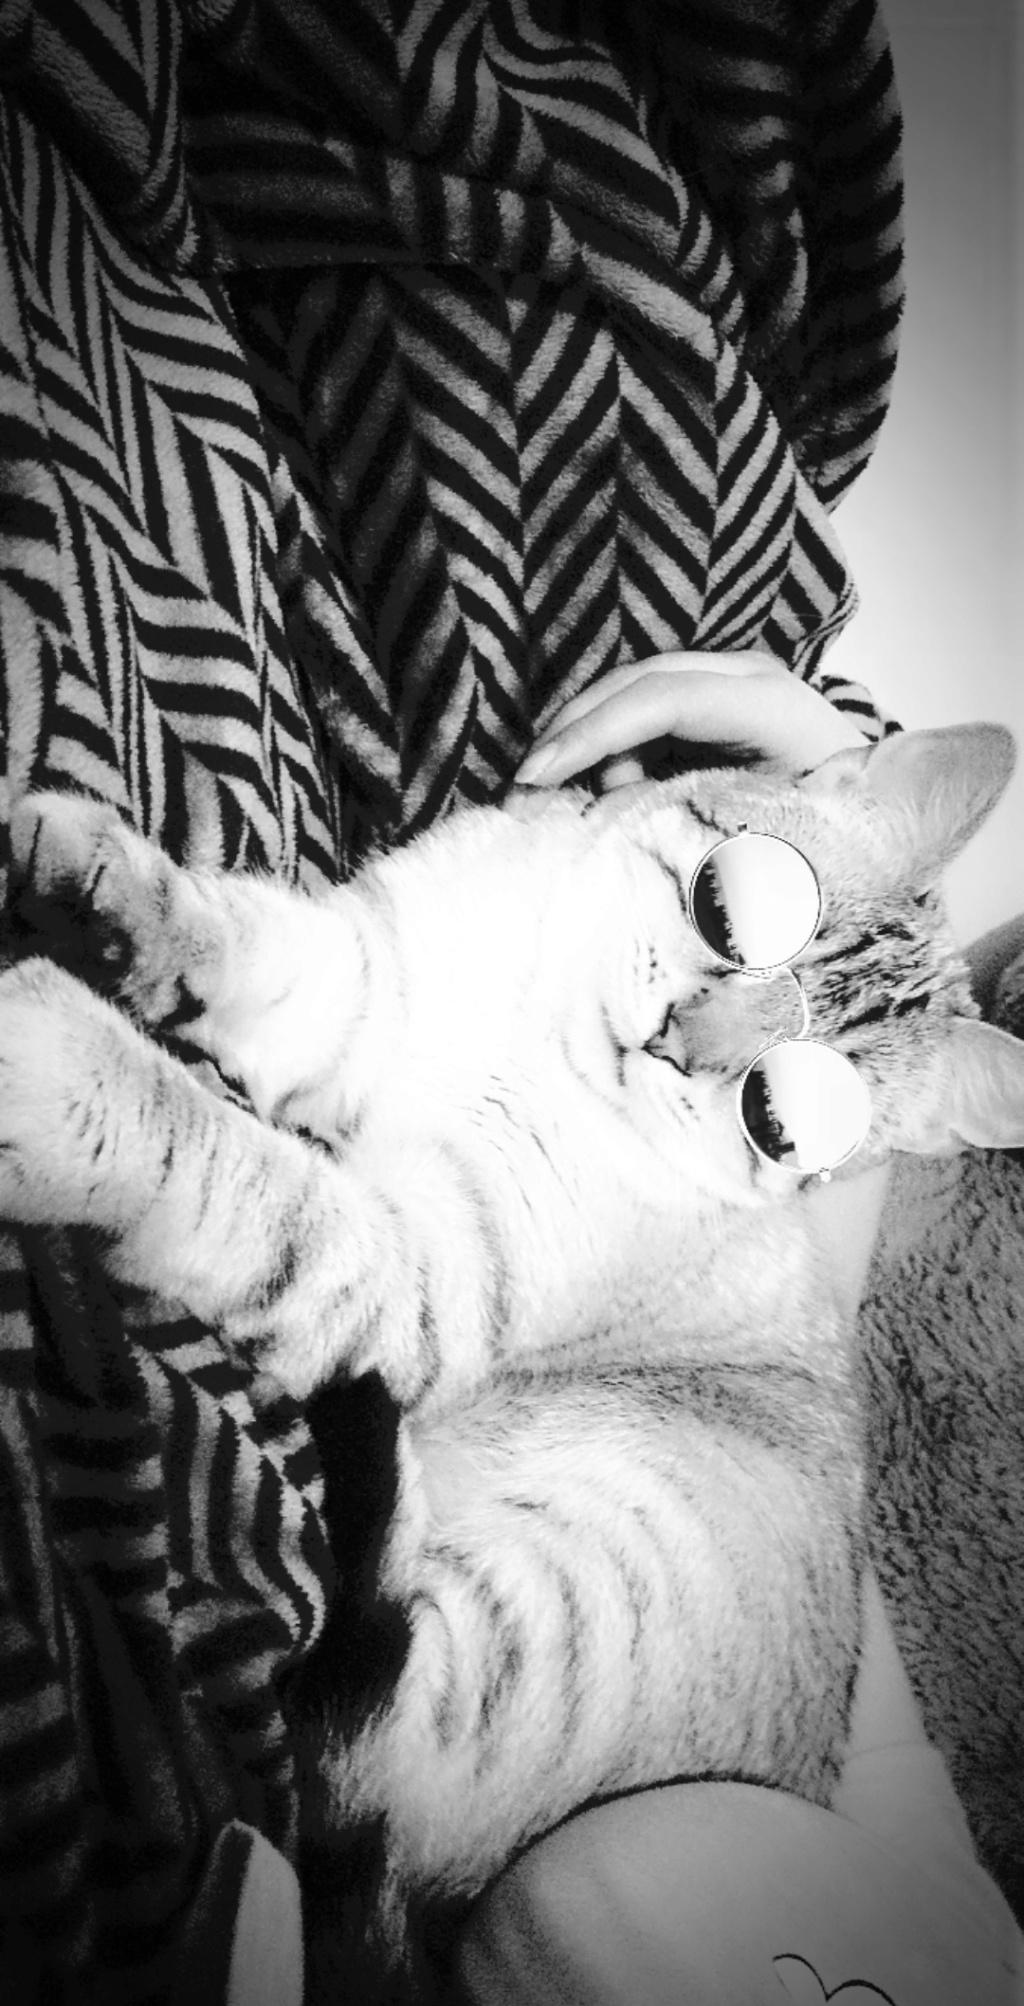 ORPHEE, chaton mâle, beige Tabby, né le 01/05/18 Snapch24